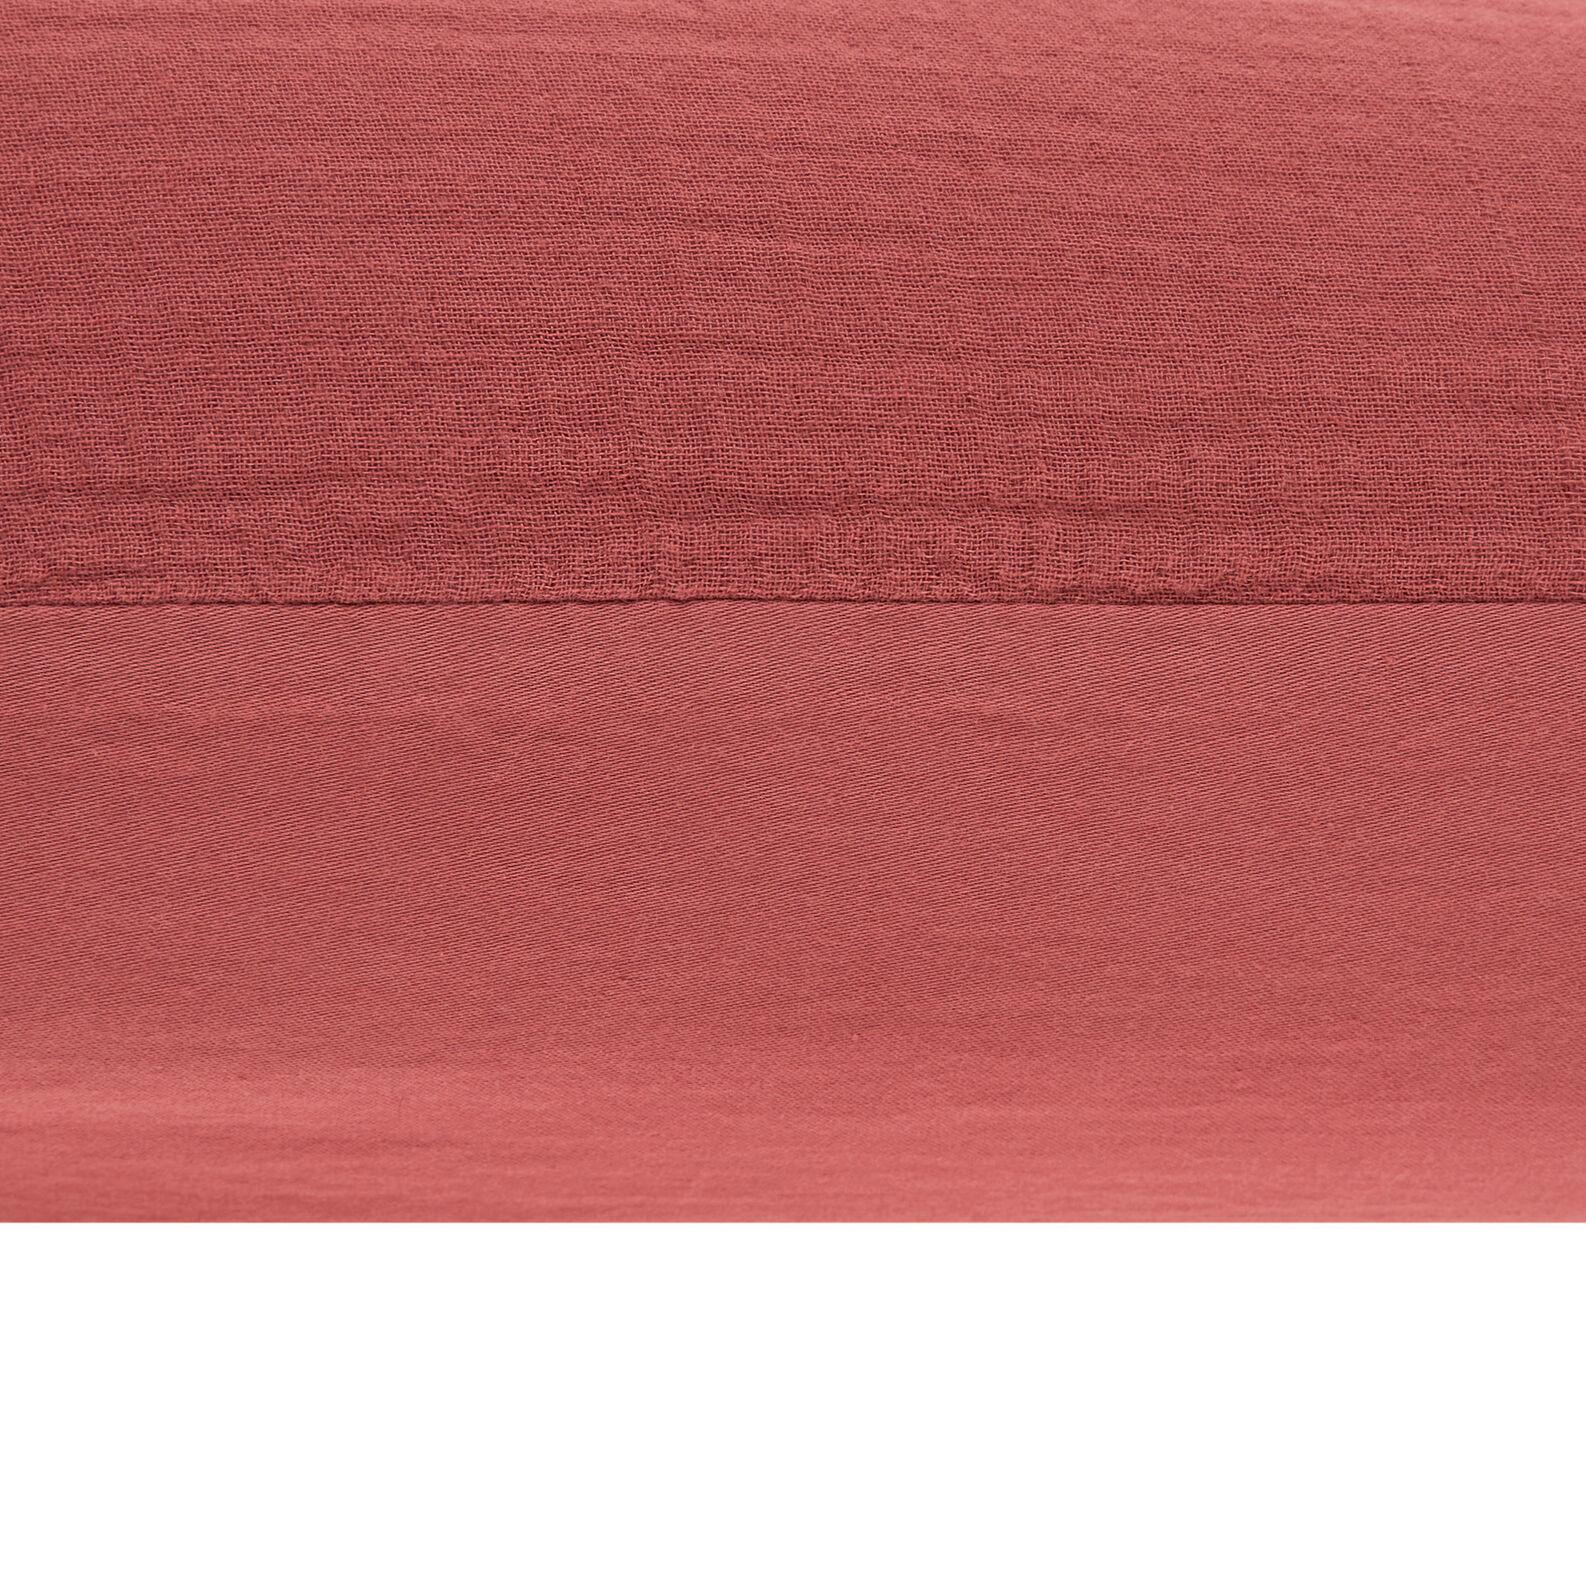 Solid colour pillowcase in cotton gauze